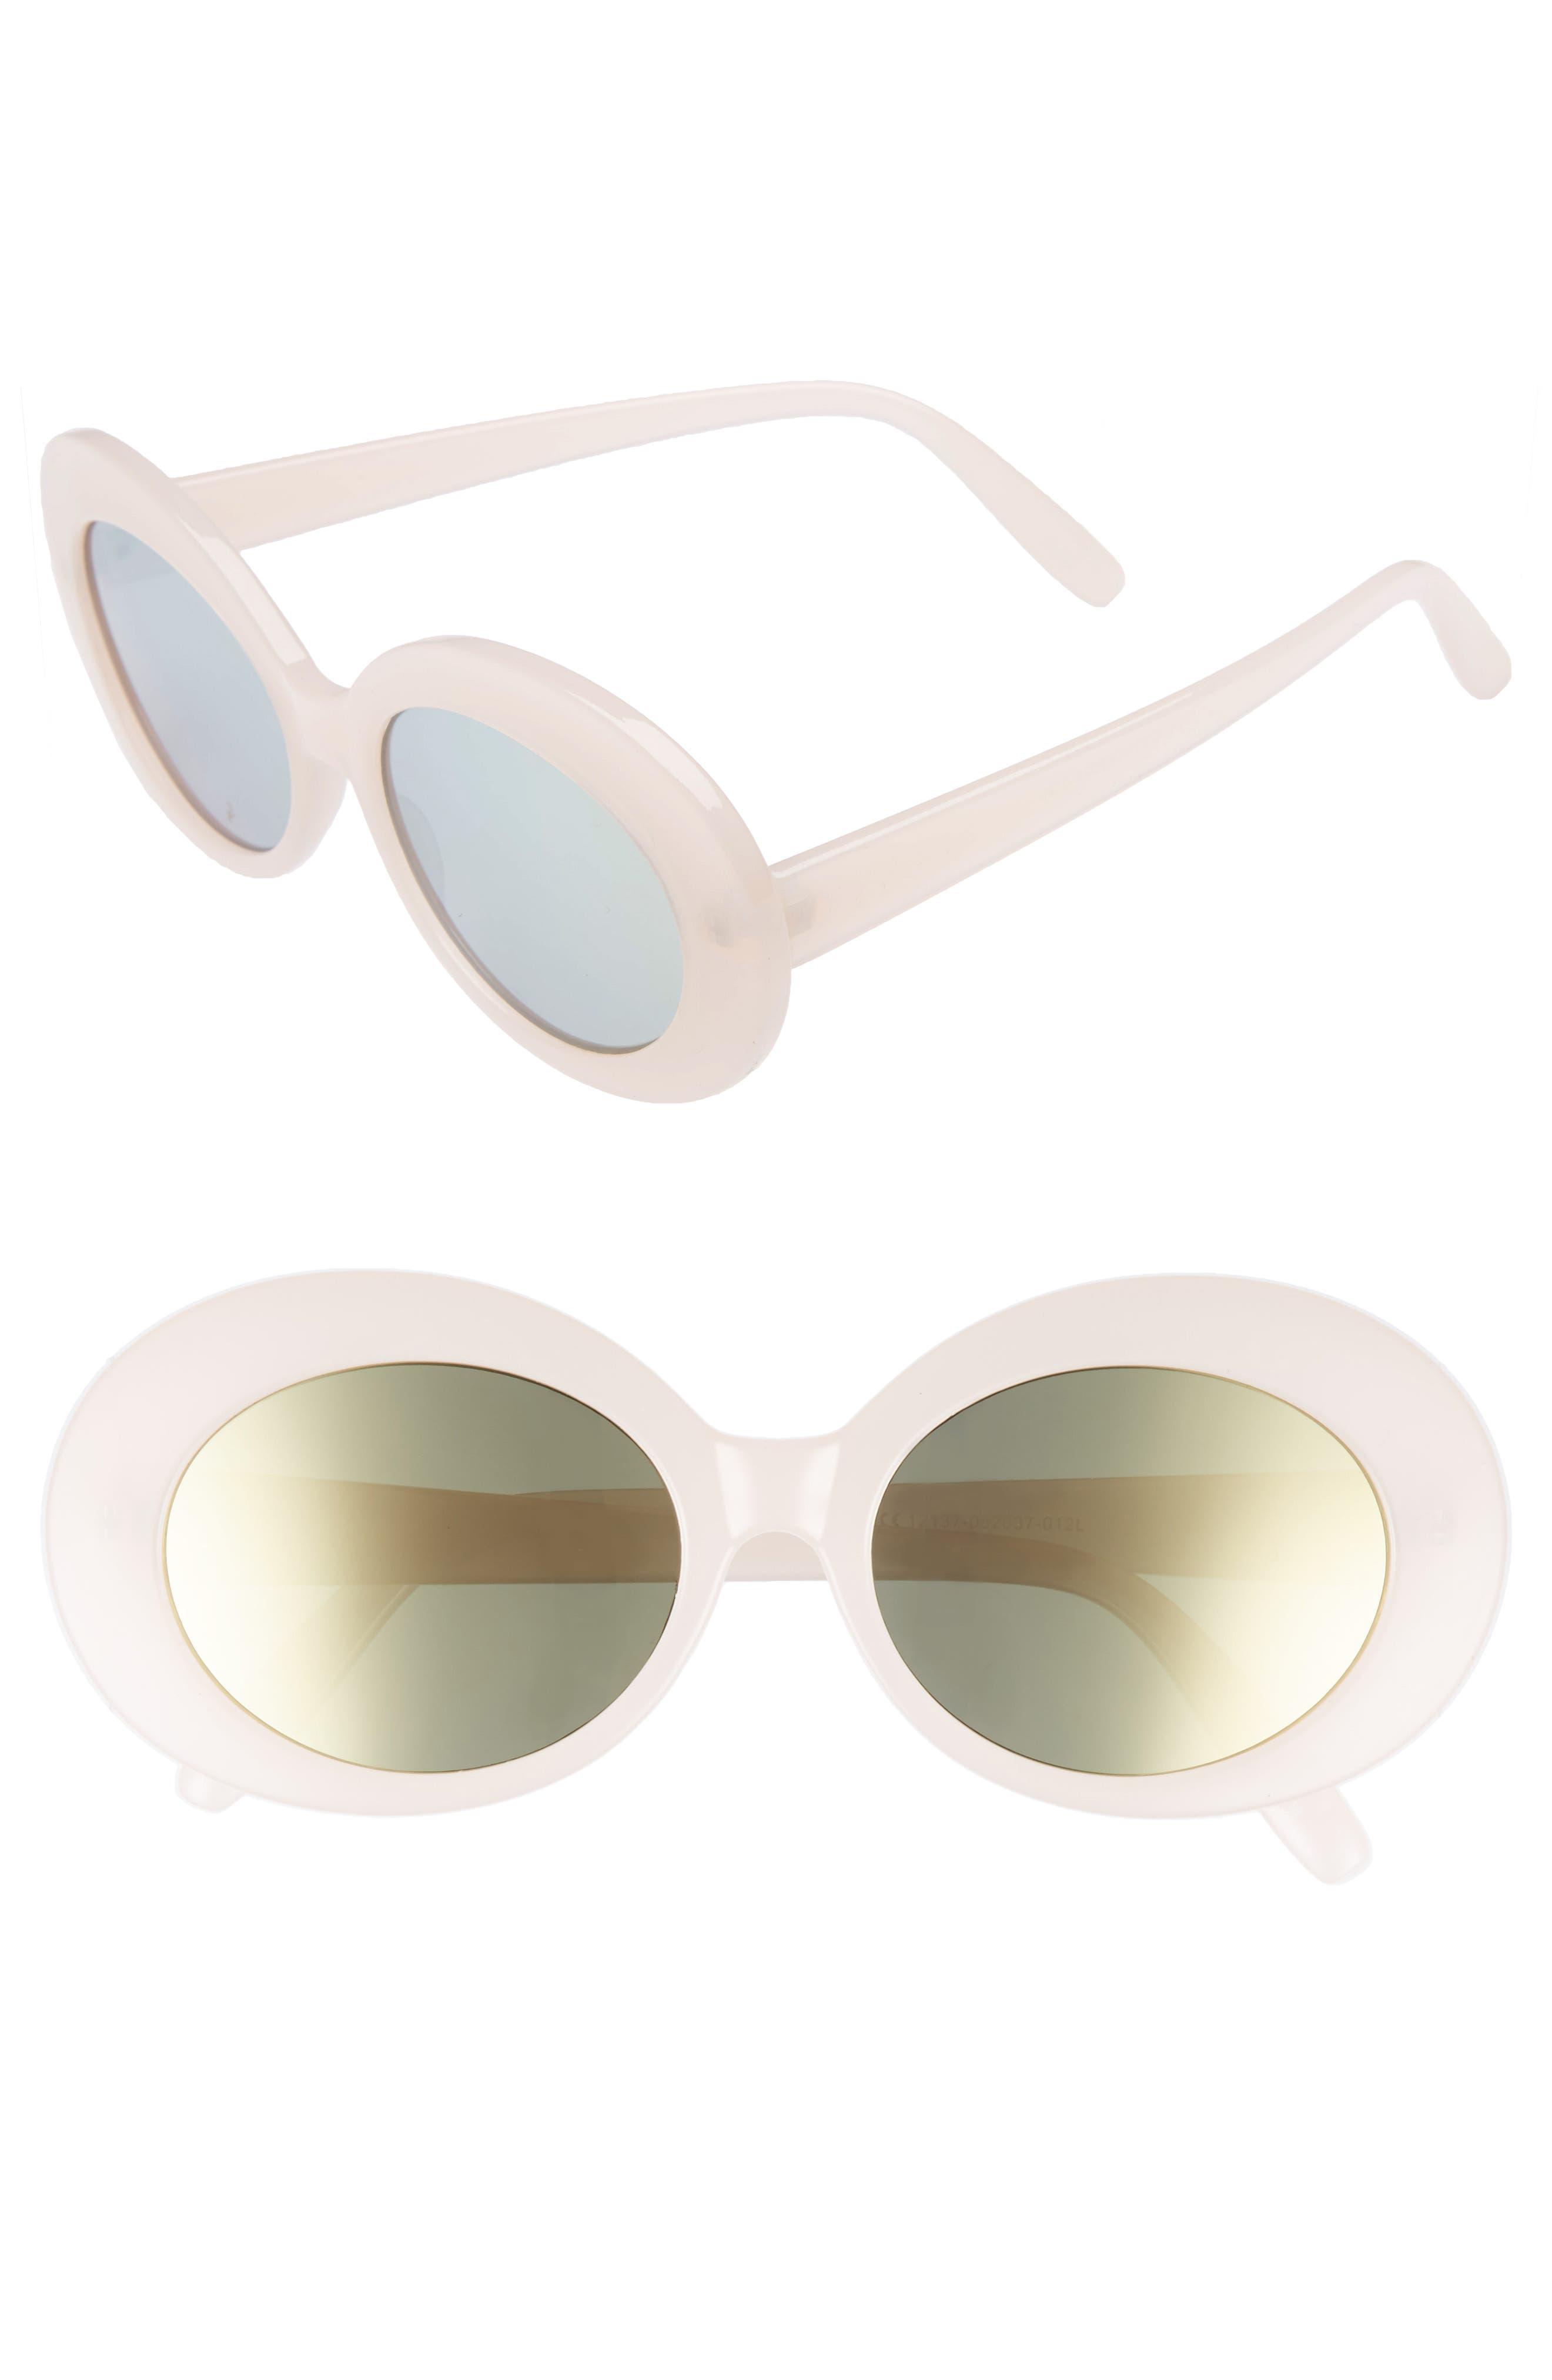 55mm Oval Sunglasses,                         Main,                         color, 650